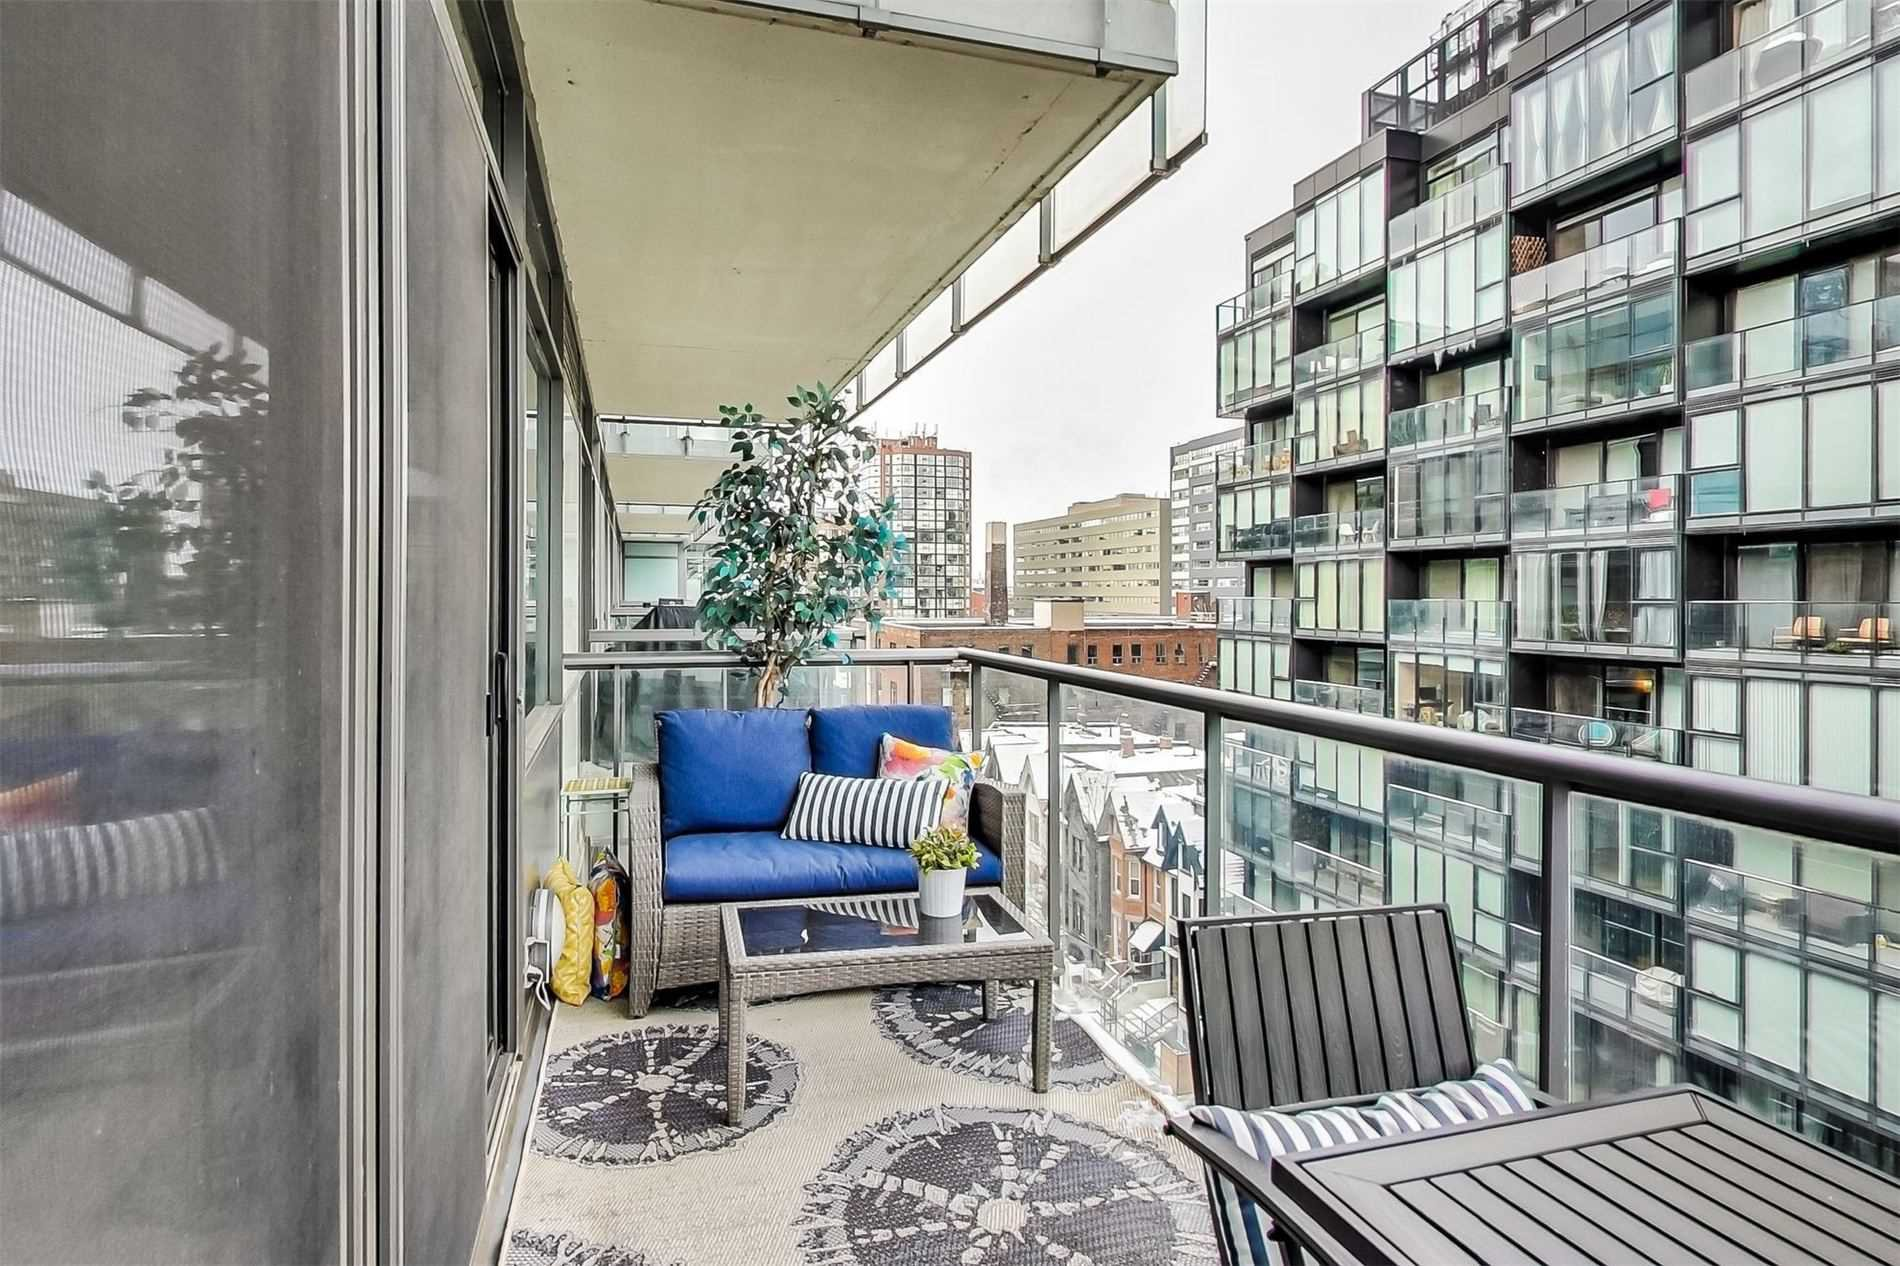 Photo 13: Photos: 818 55 Stewart Street in Toronto: Waterfront Communities C1 Condo for sale (Toronto C01)  : MLS®# C4690098